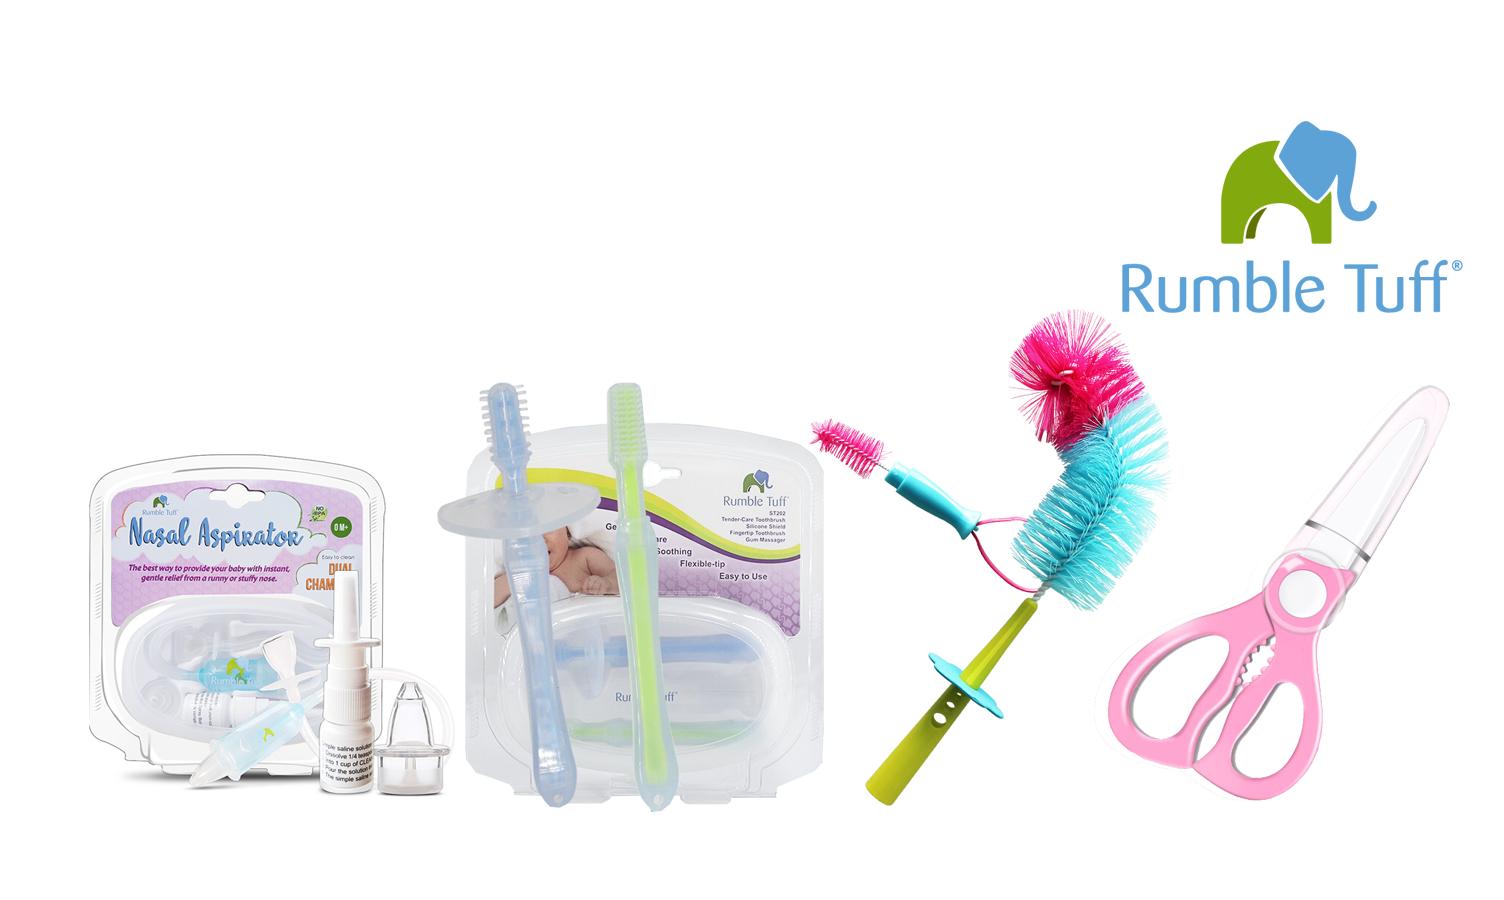 Rumbletuff(瑞宝多)丨宝宝用品系列